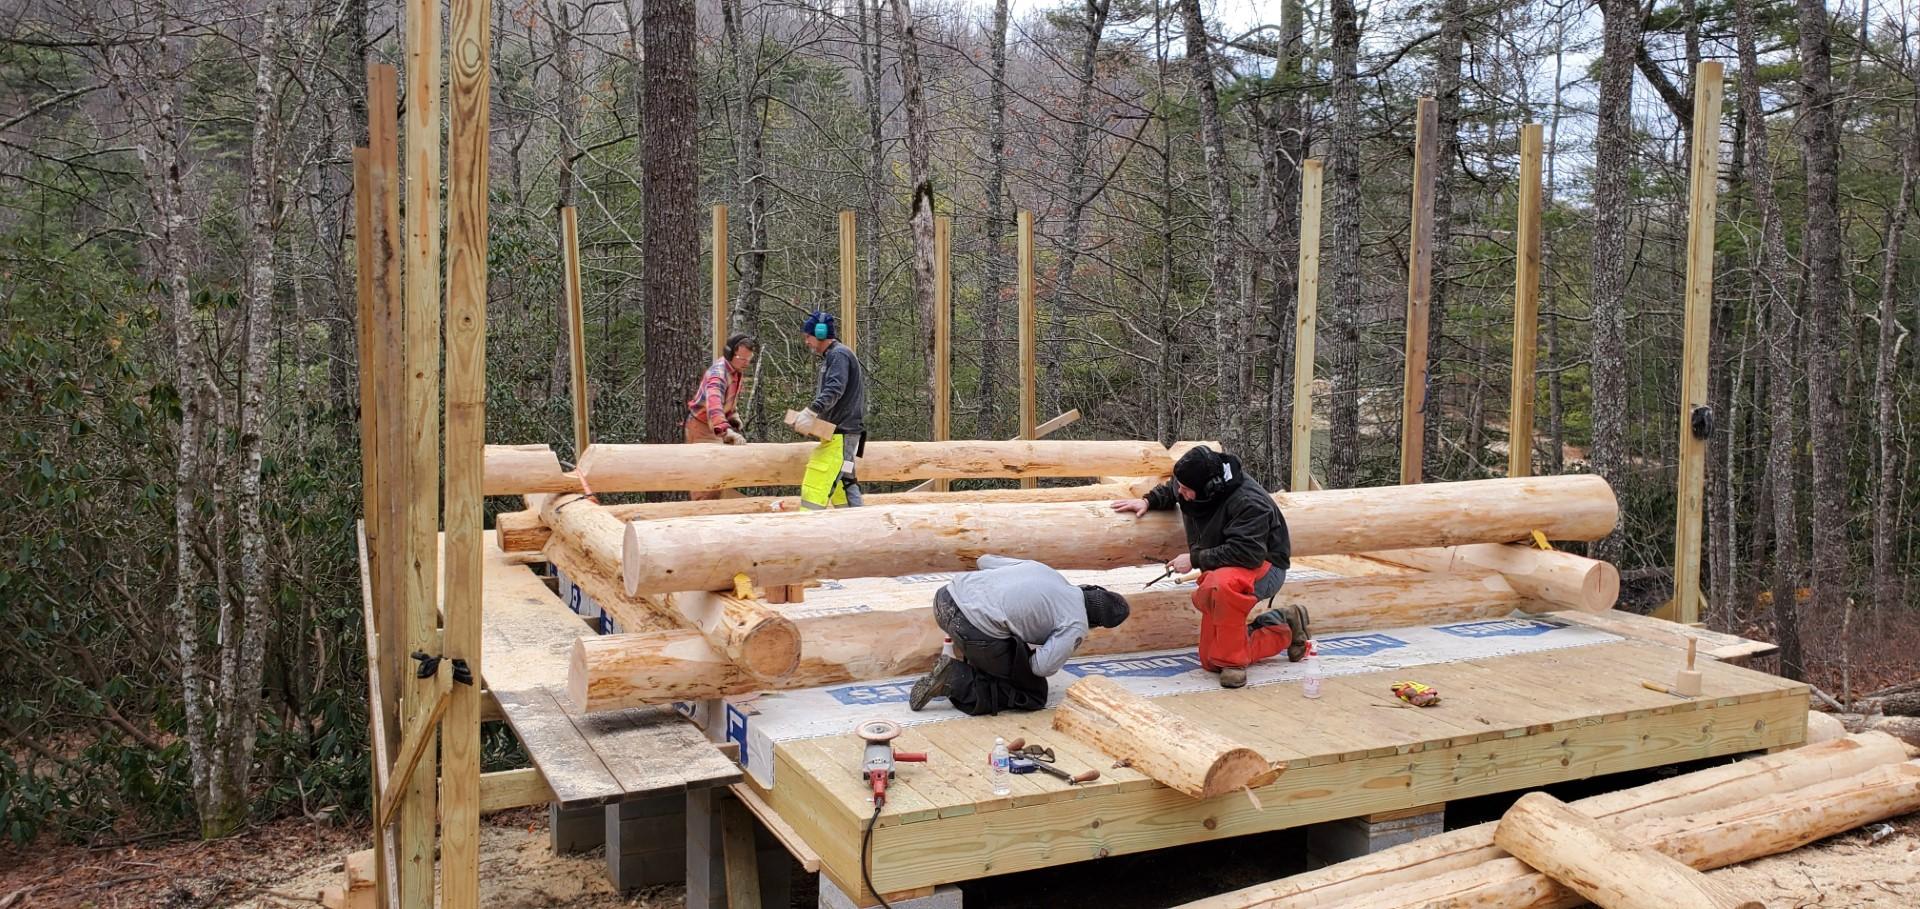 Volunteers Build Cabins at Blue Ridge